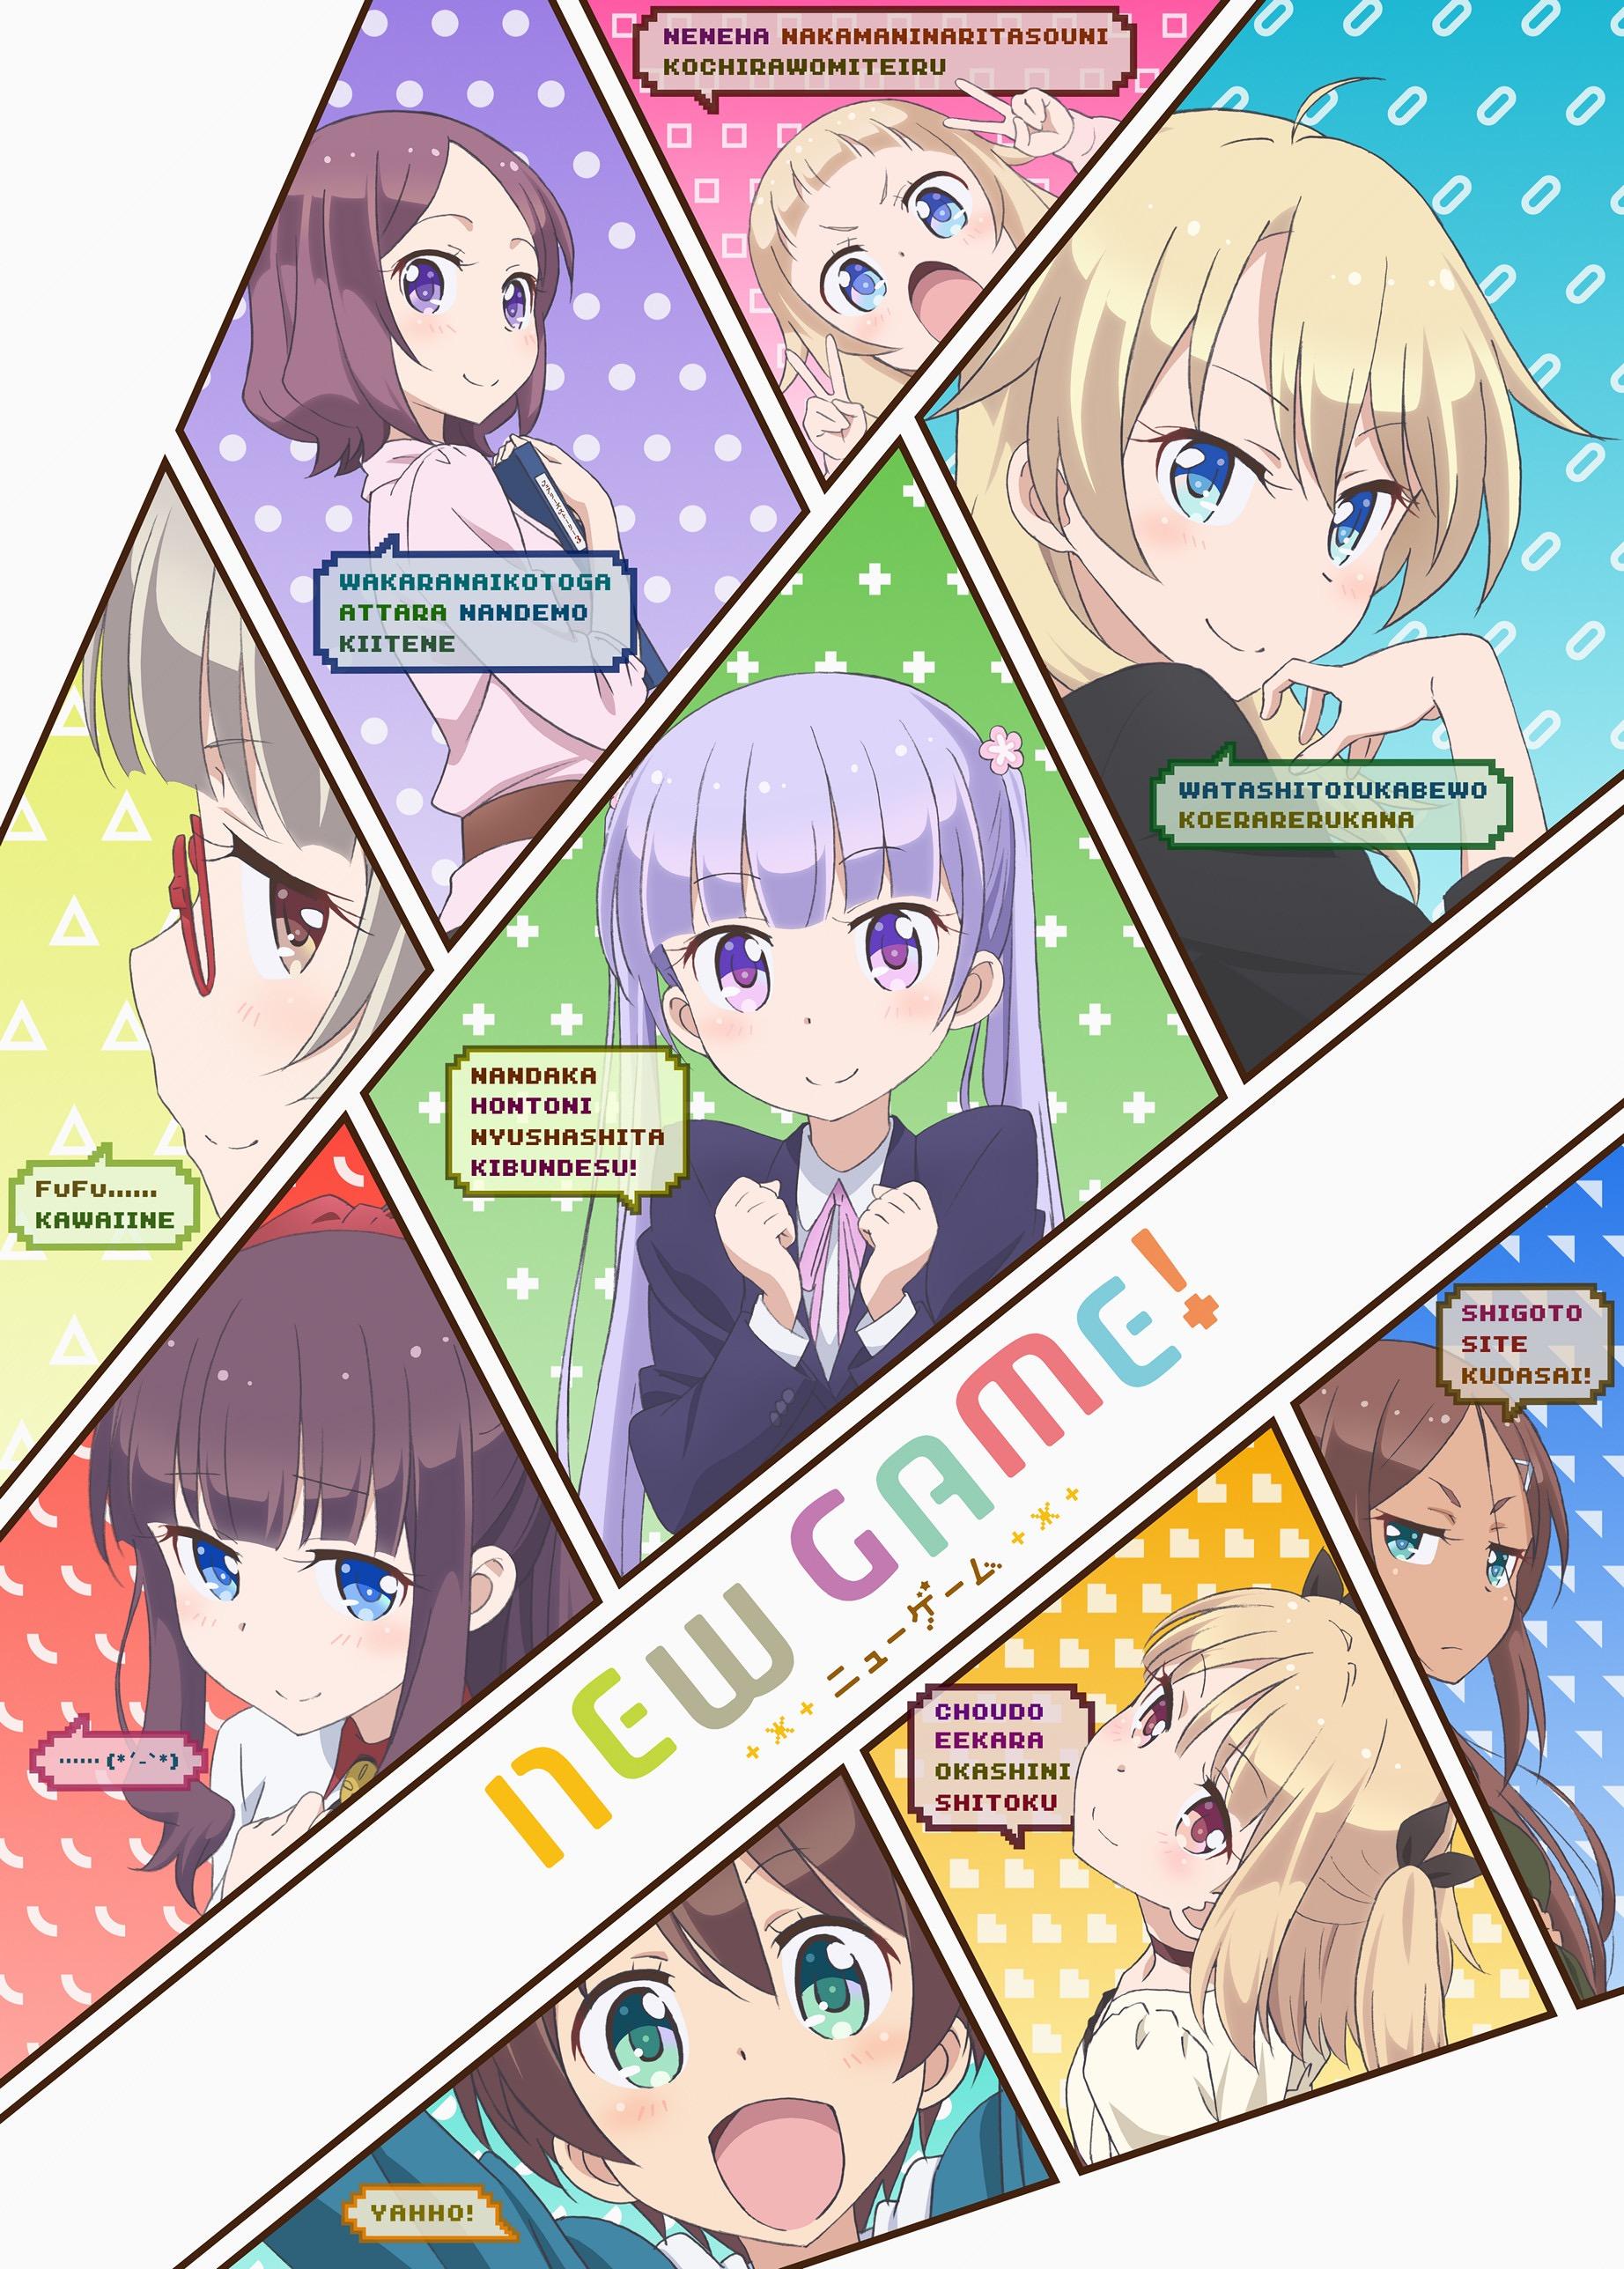 NEW GAME!の画像 p1_21